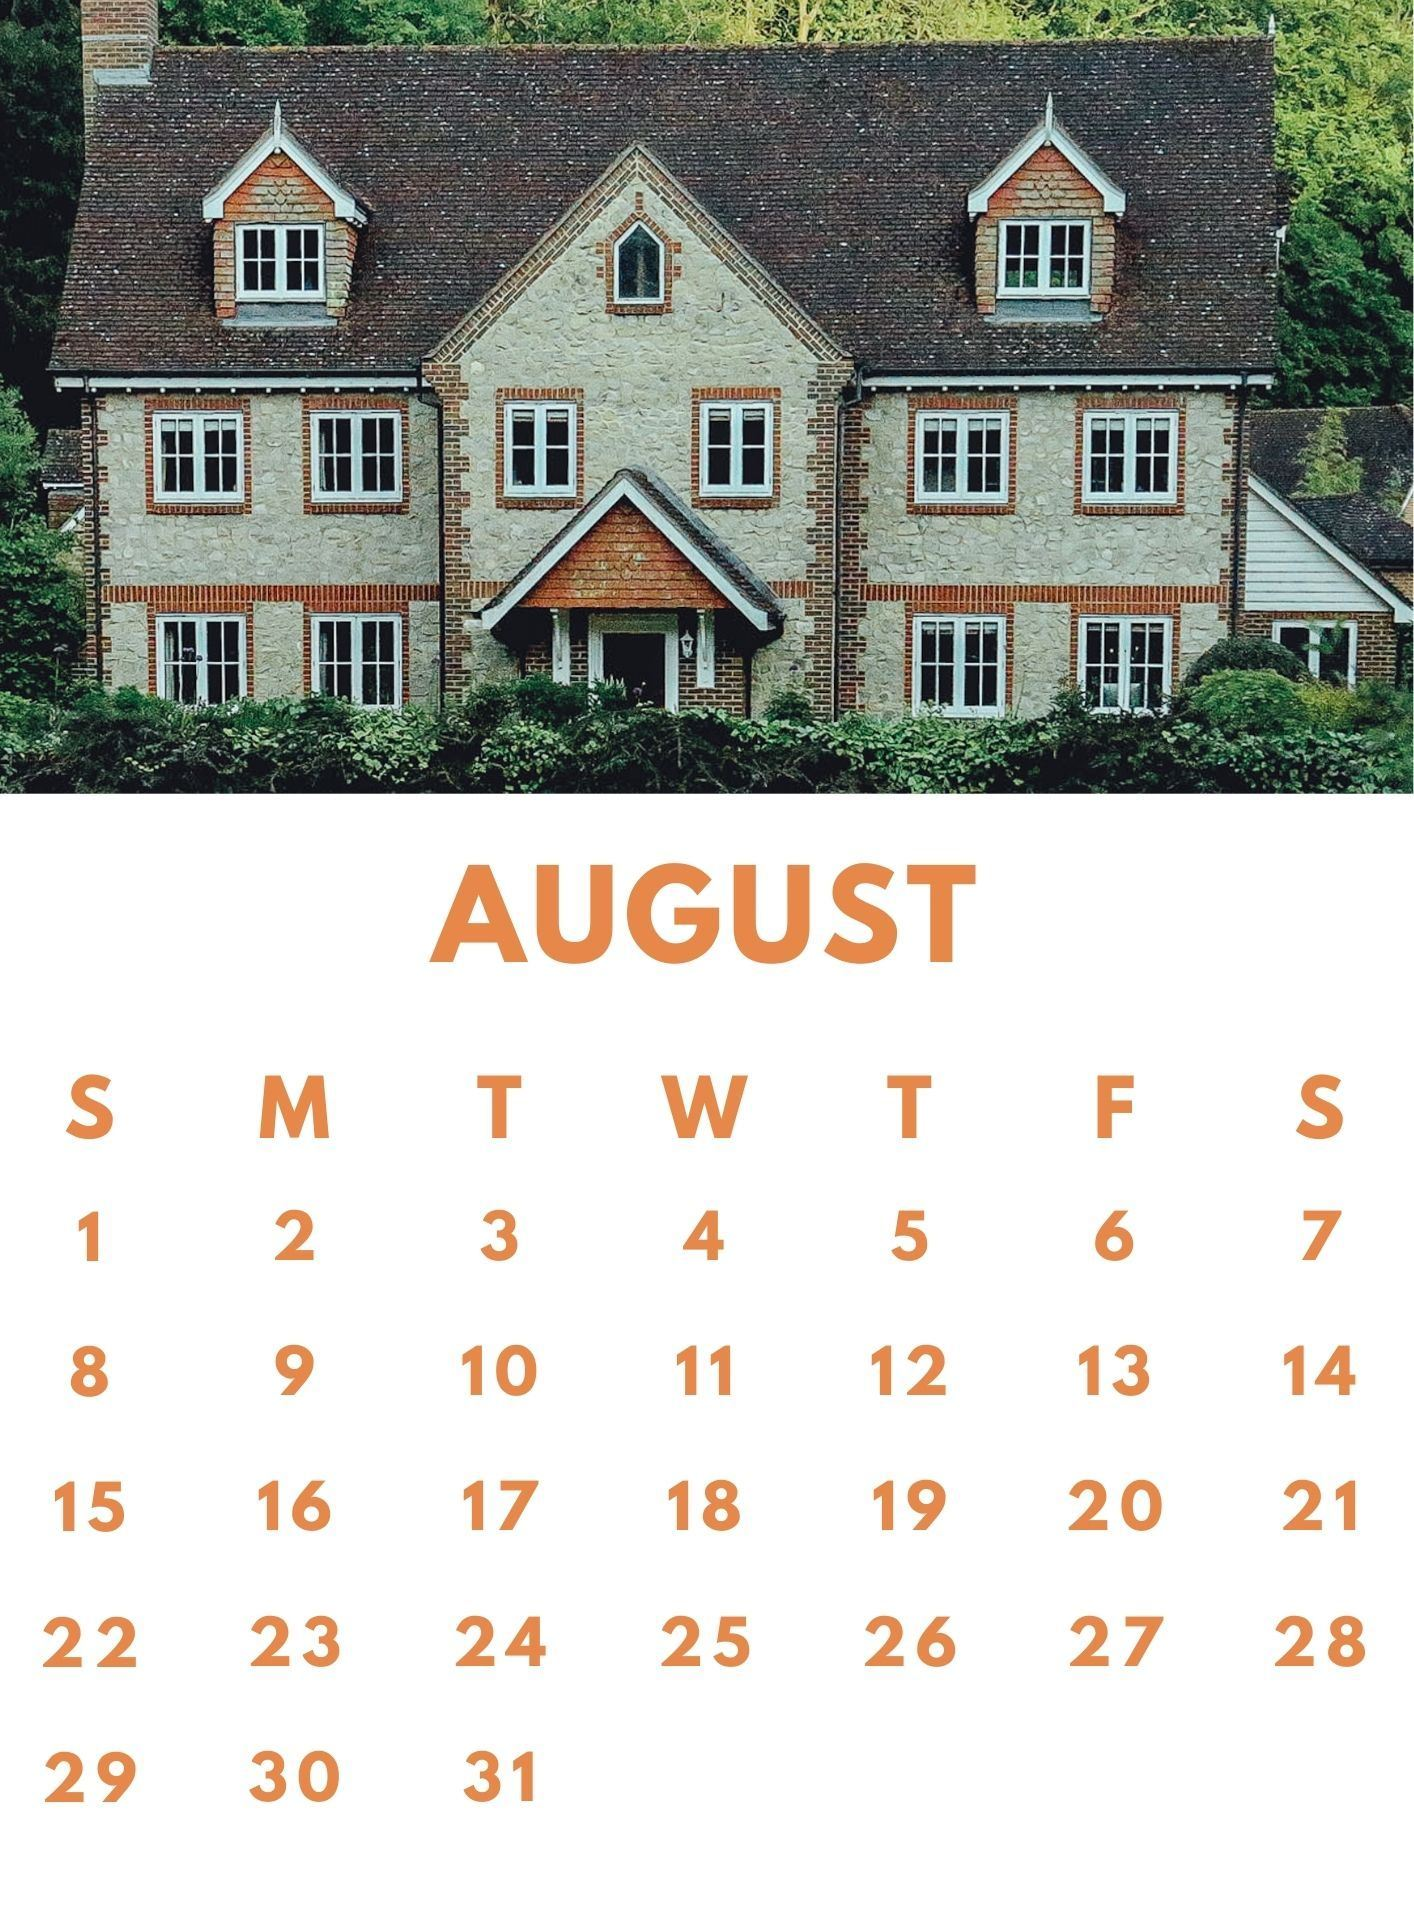 August 2021 Mobile Calendar Wallpaper